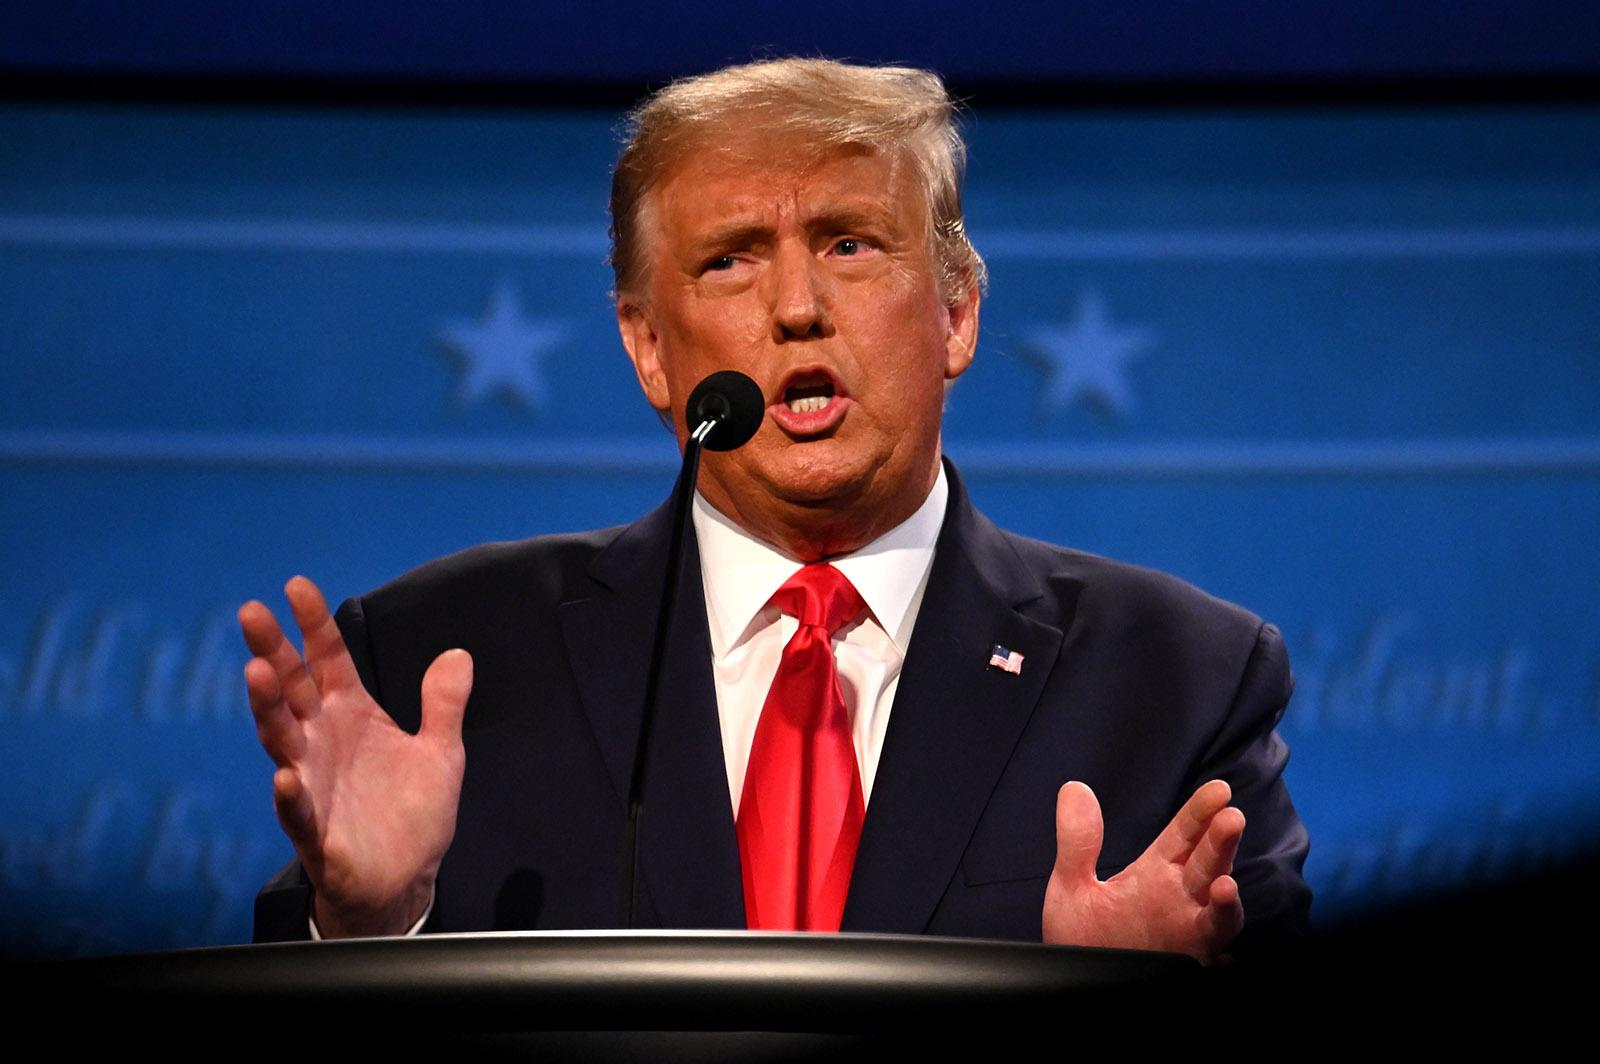 President Donald Trump gestures as he speaks during the final presidential debate at Belmont University in Nashville on Thursday.